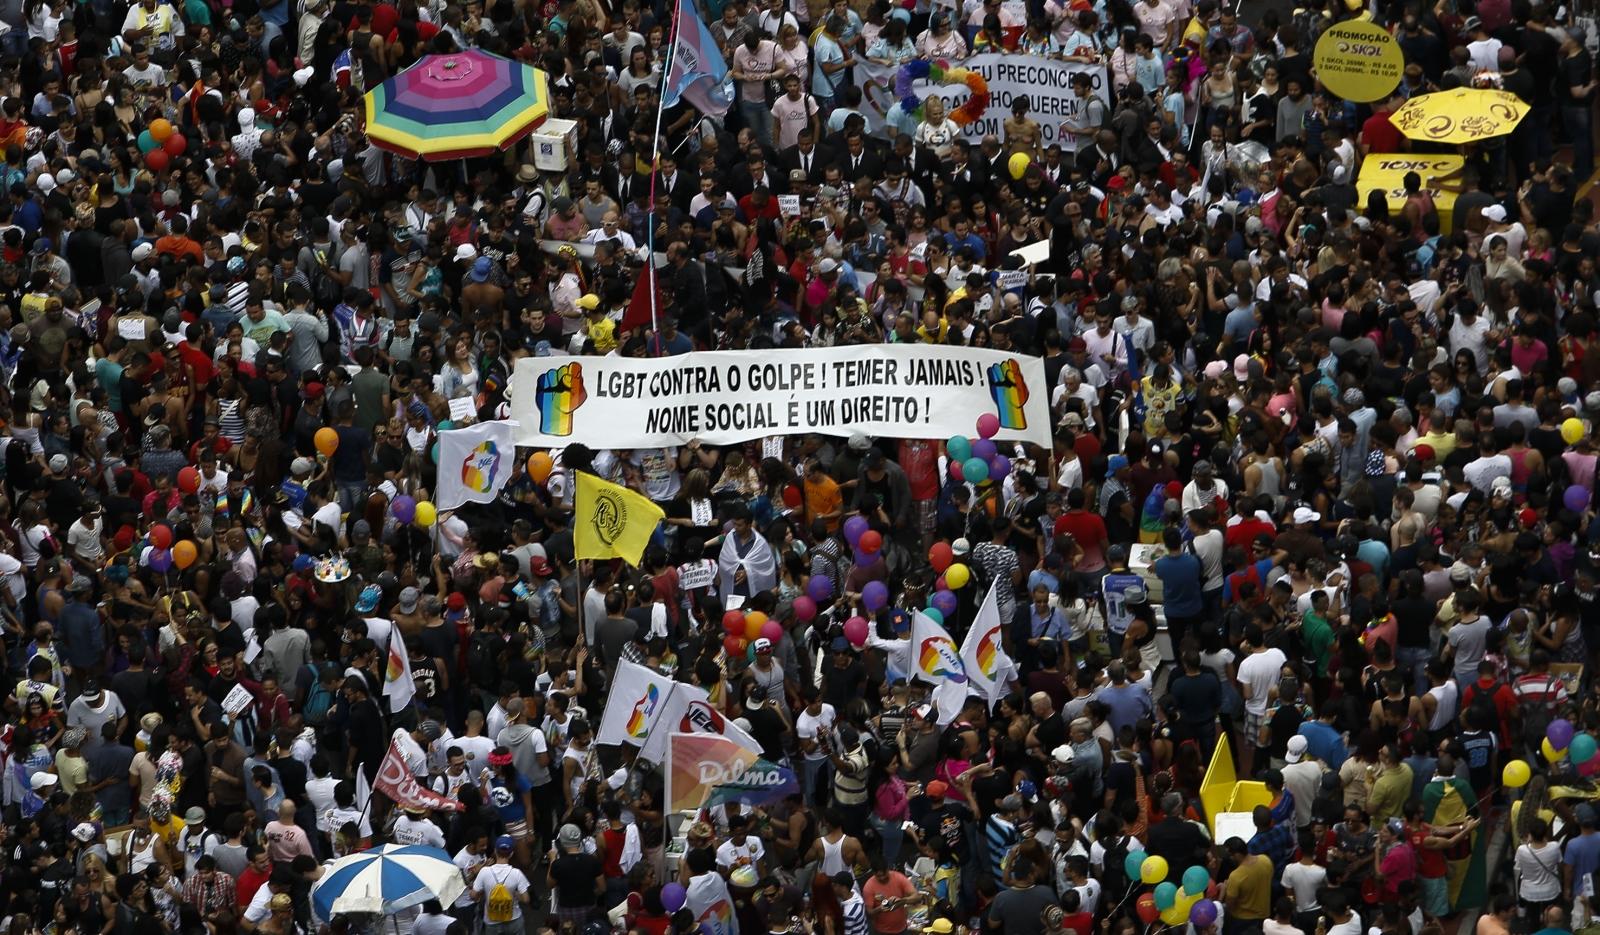 Sao Paulo LGBT pride